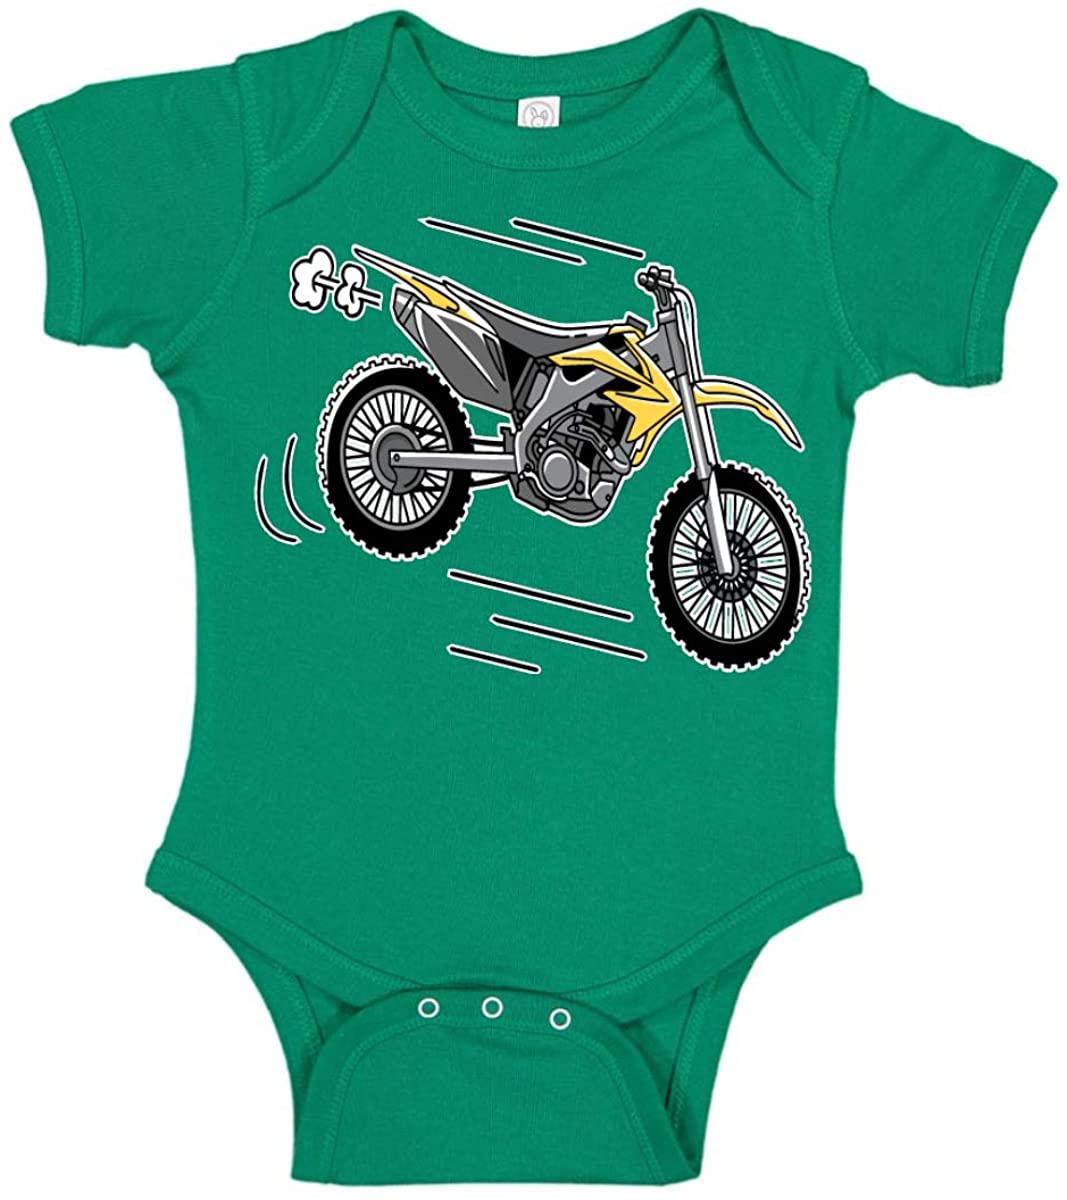 Wild Bobby Yellow Fast Dirt Bike Humor Baby Creeper Boys Girls Infant Bodysuit